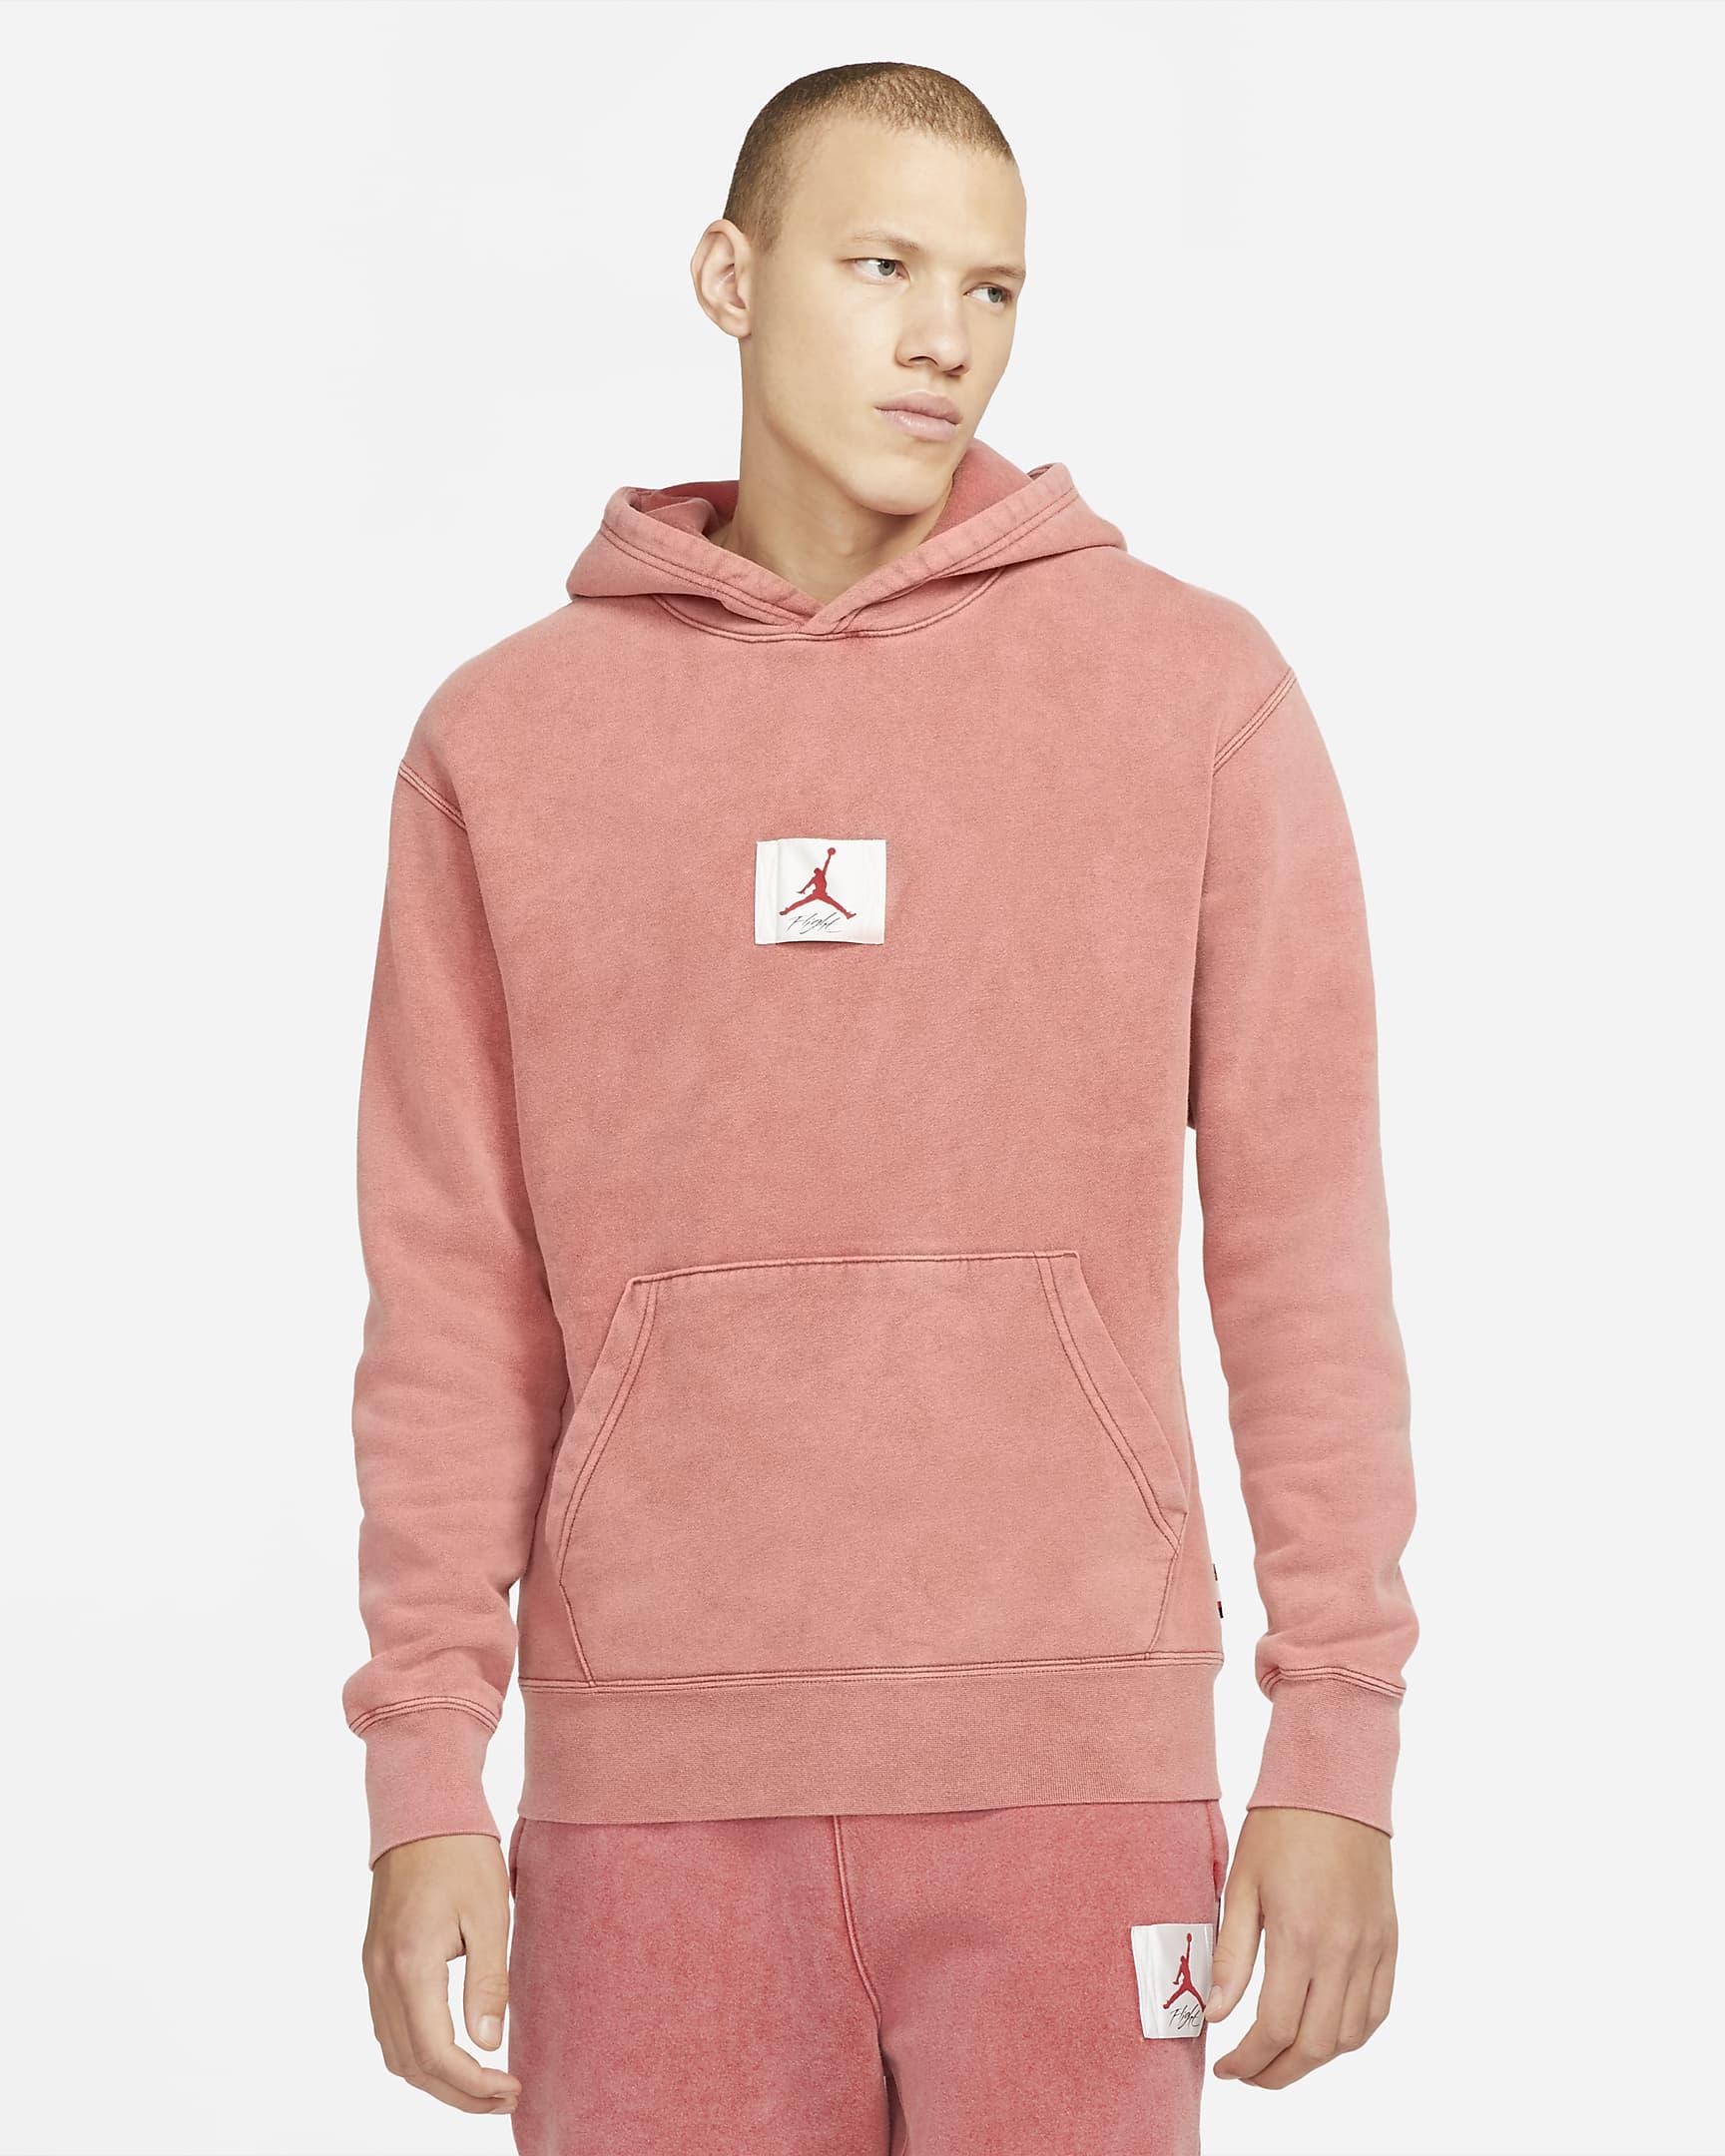 jordan-flight-fleece-mens-graphic-pullover-hoodie-k08dgs